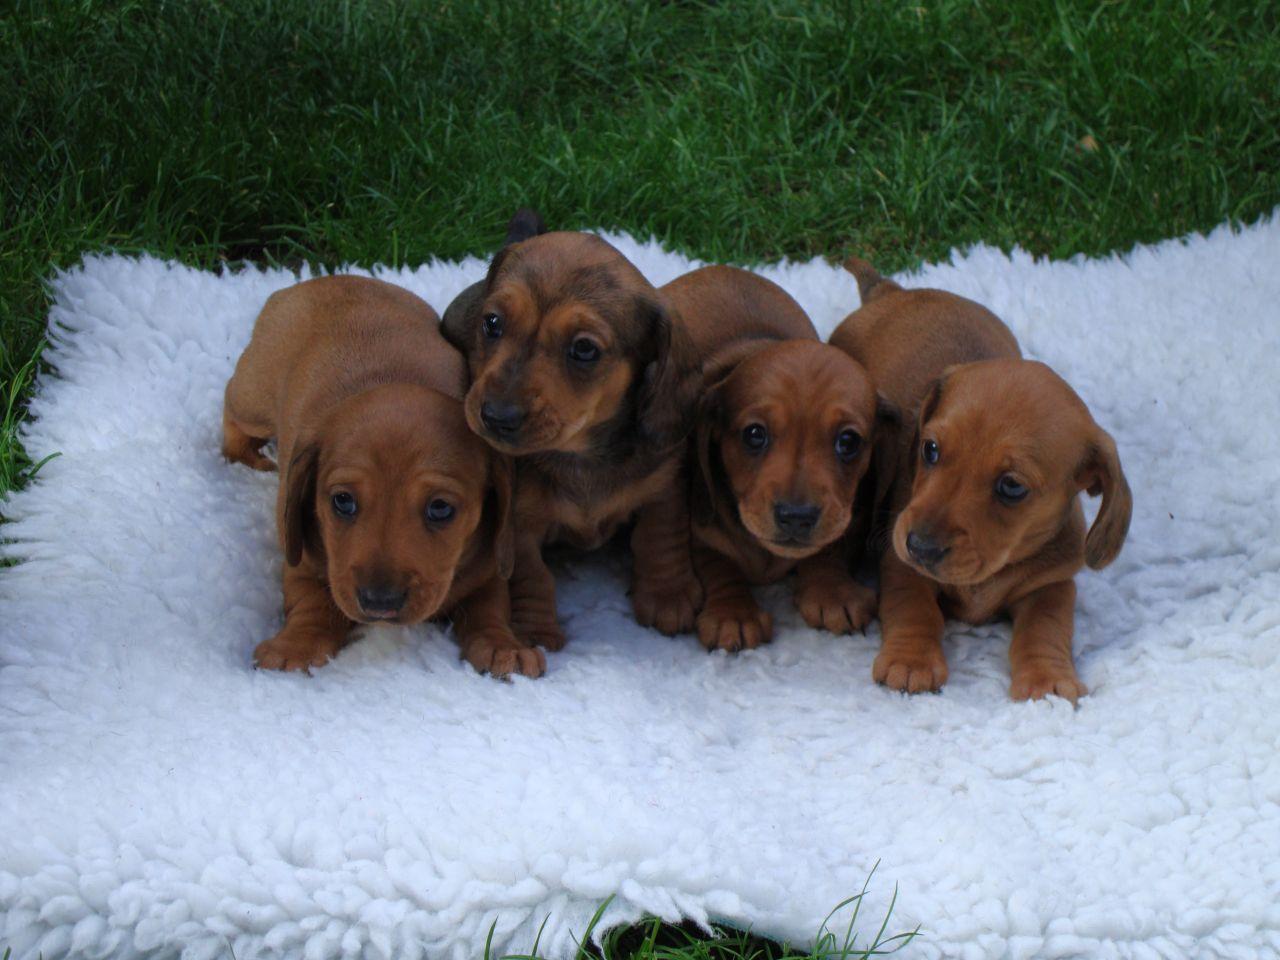 Red Smooth Mini Dachshund Puppies Sheep Dog Puppy Dachshund Puppies Dapple Dachshund Puppy